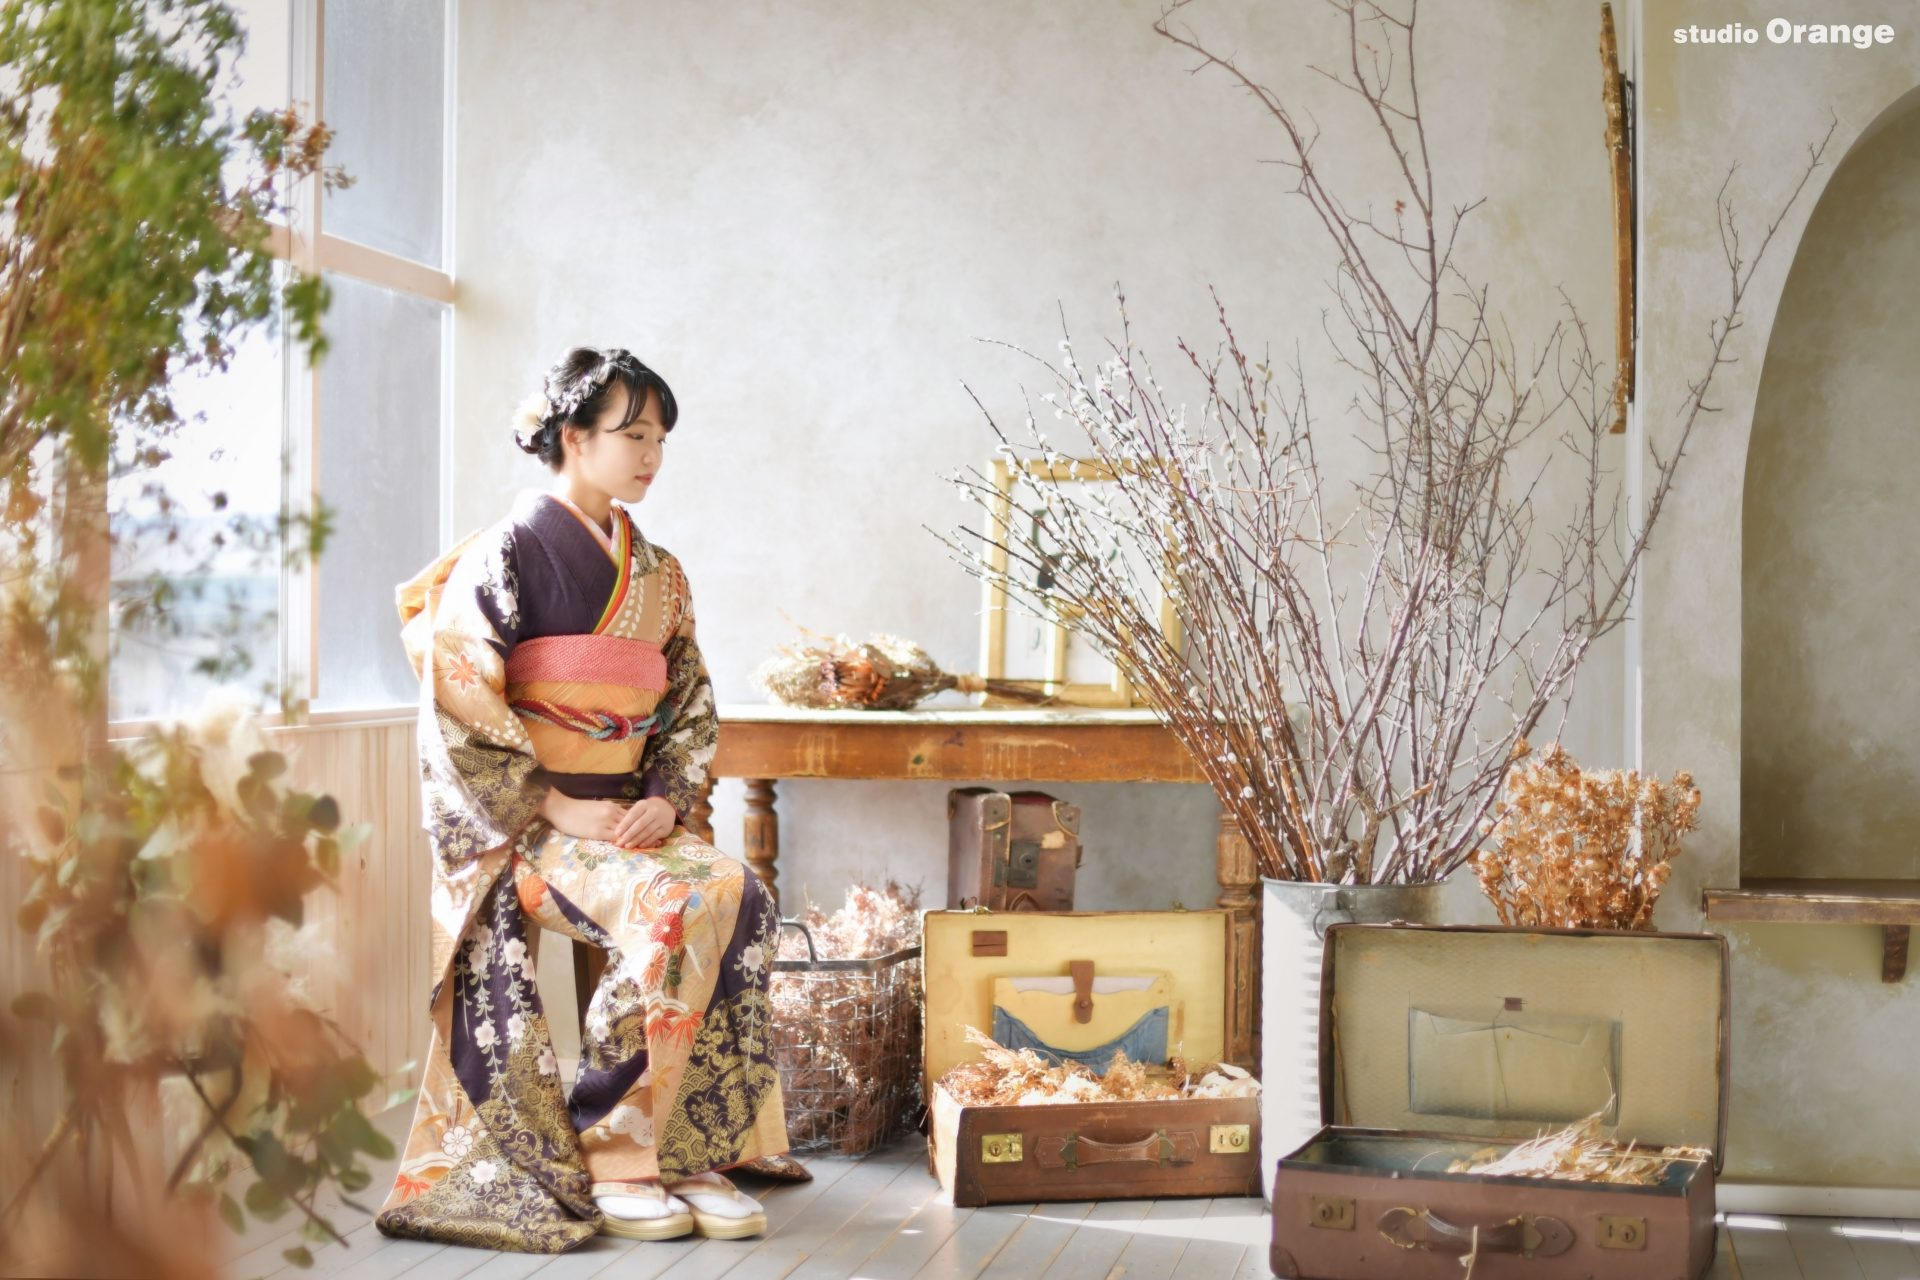 奈良県生駒市 ママ振 2021年成人式前撮り 19歳